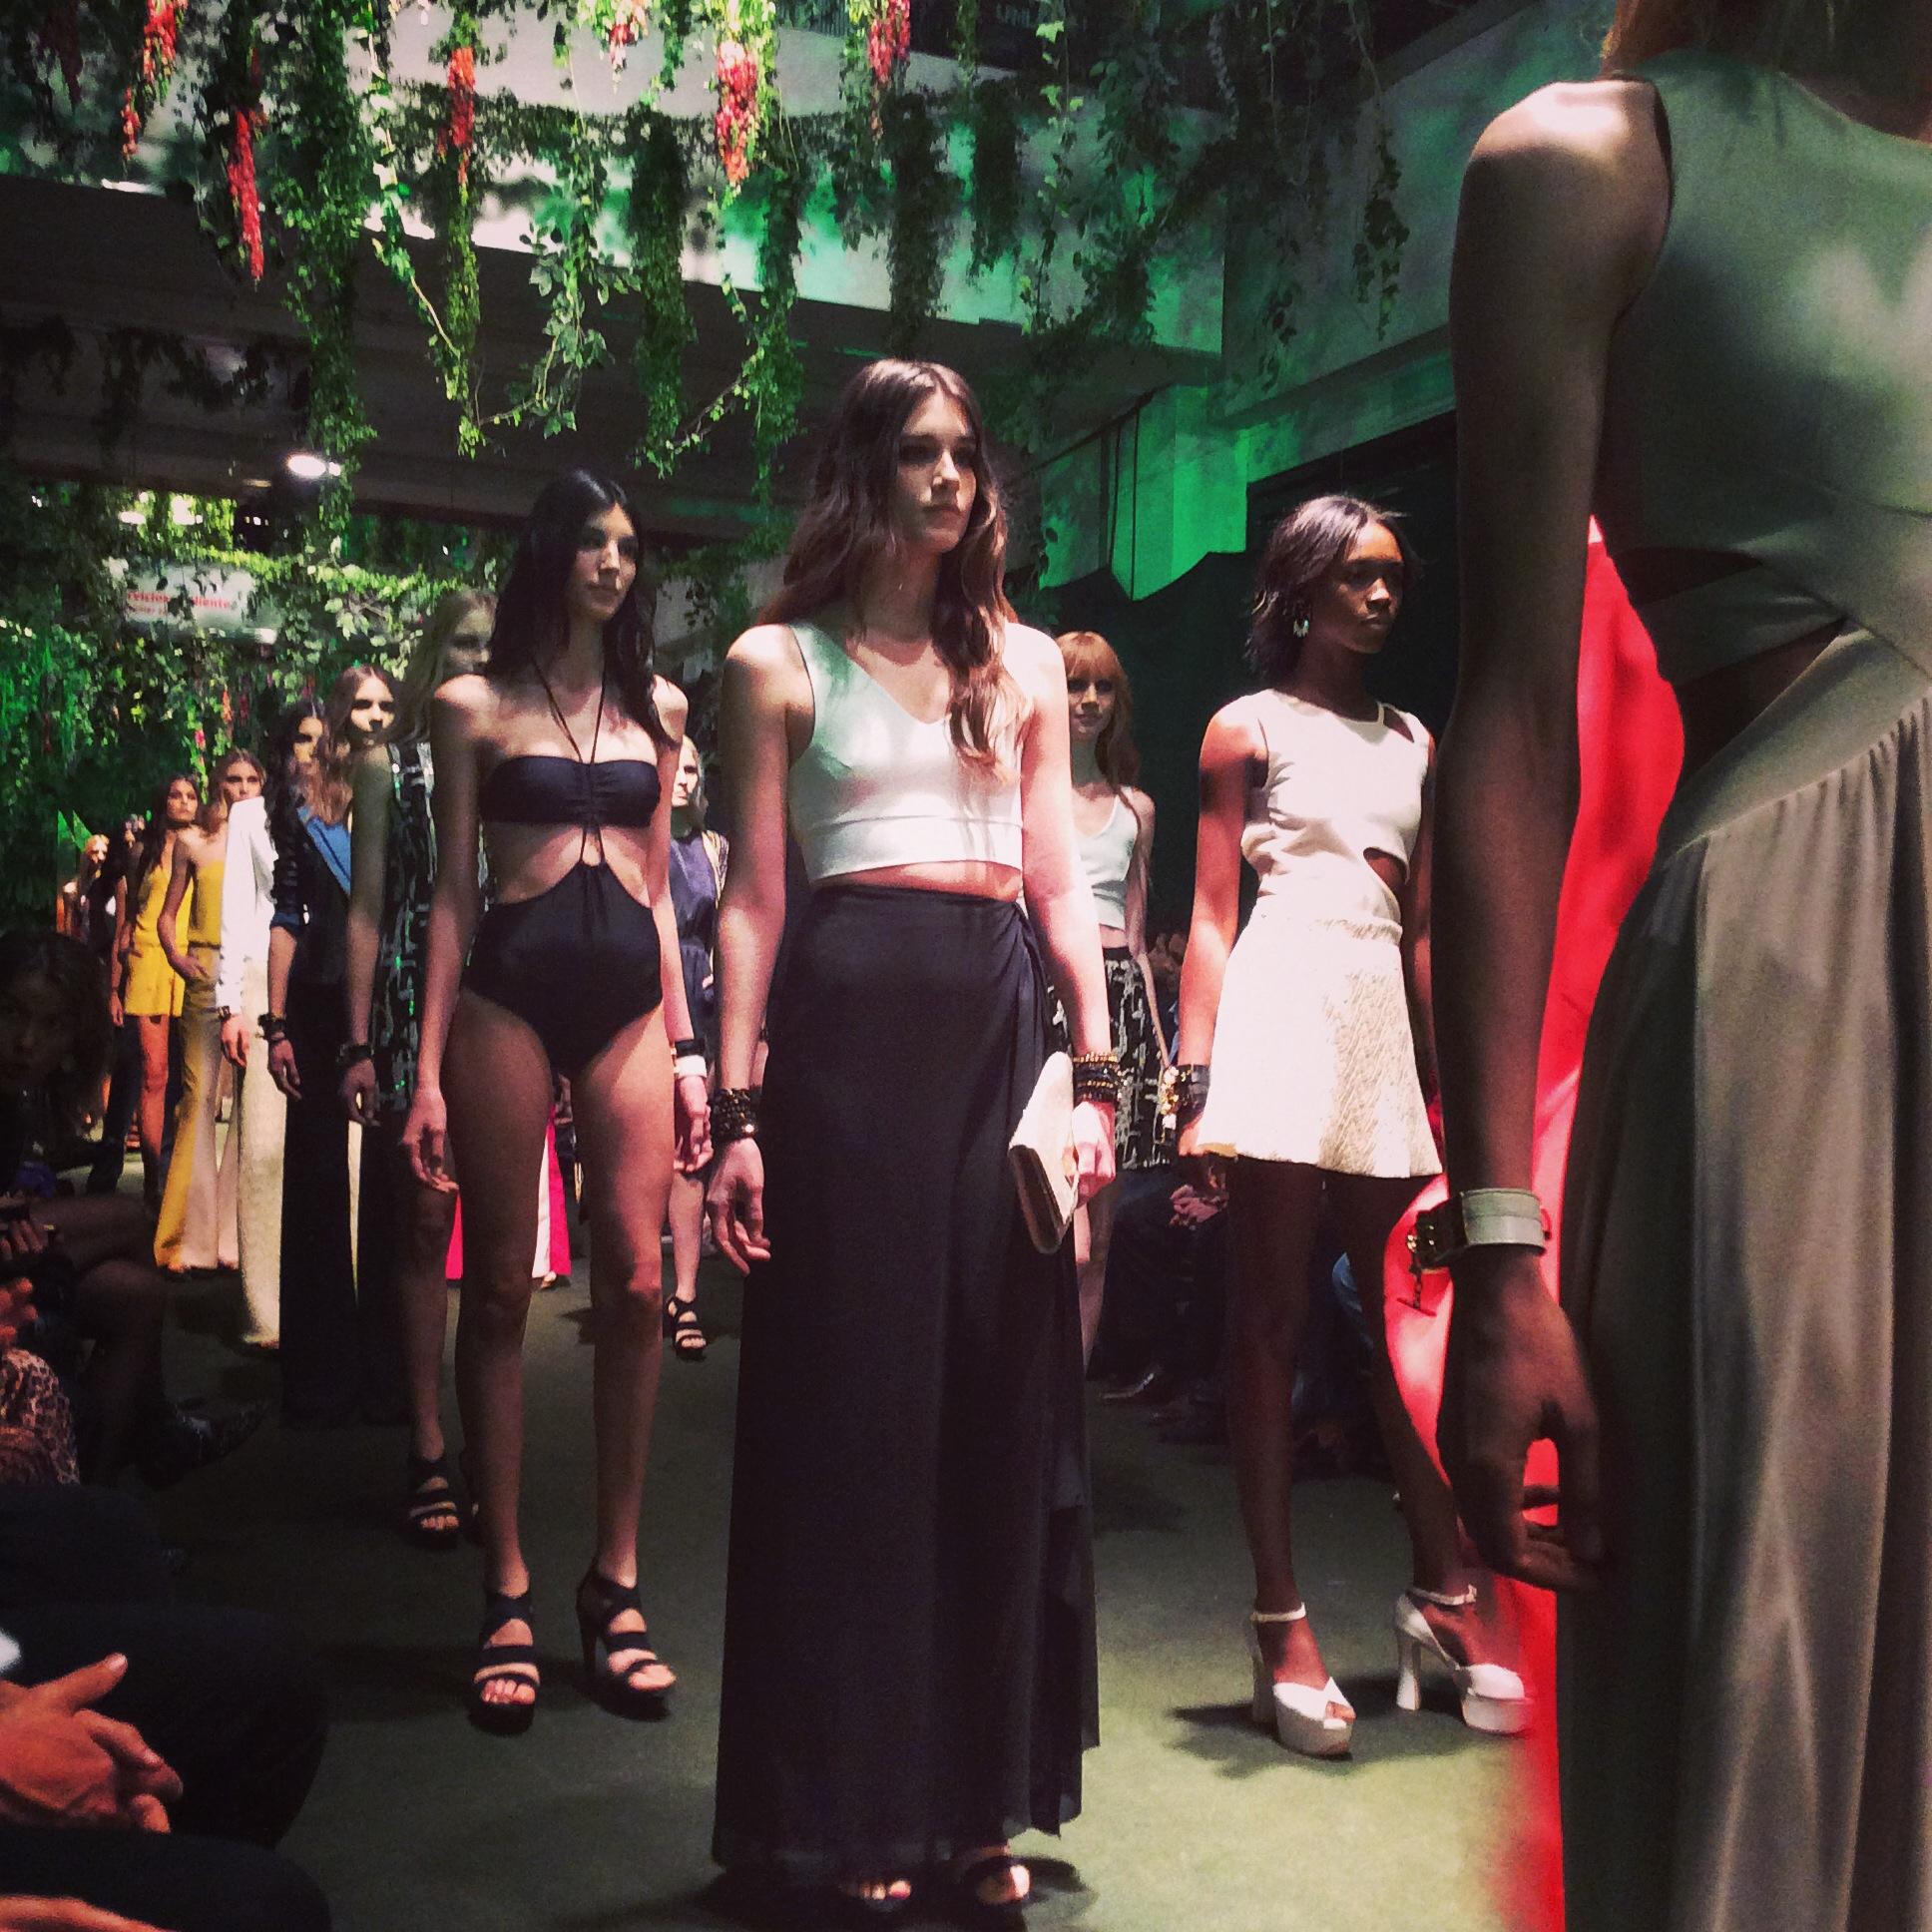 naima_bafwee_verano_2015_alcorta_shopping_5